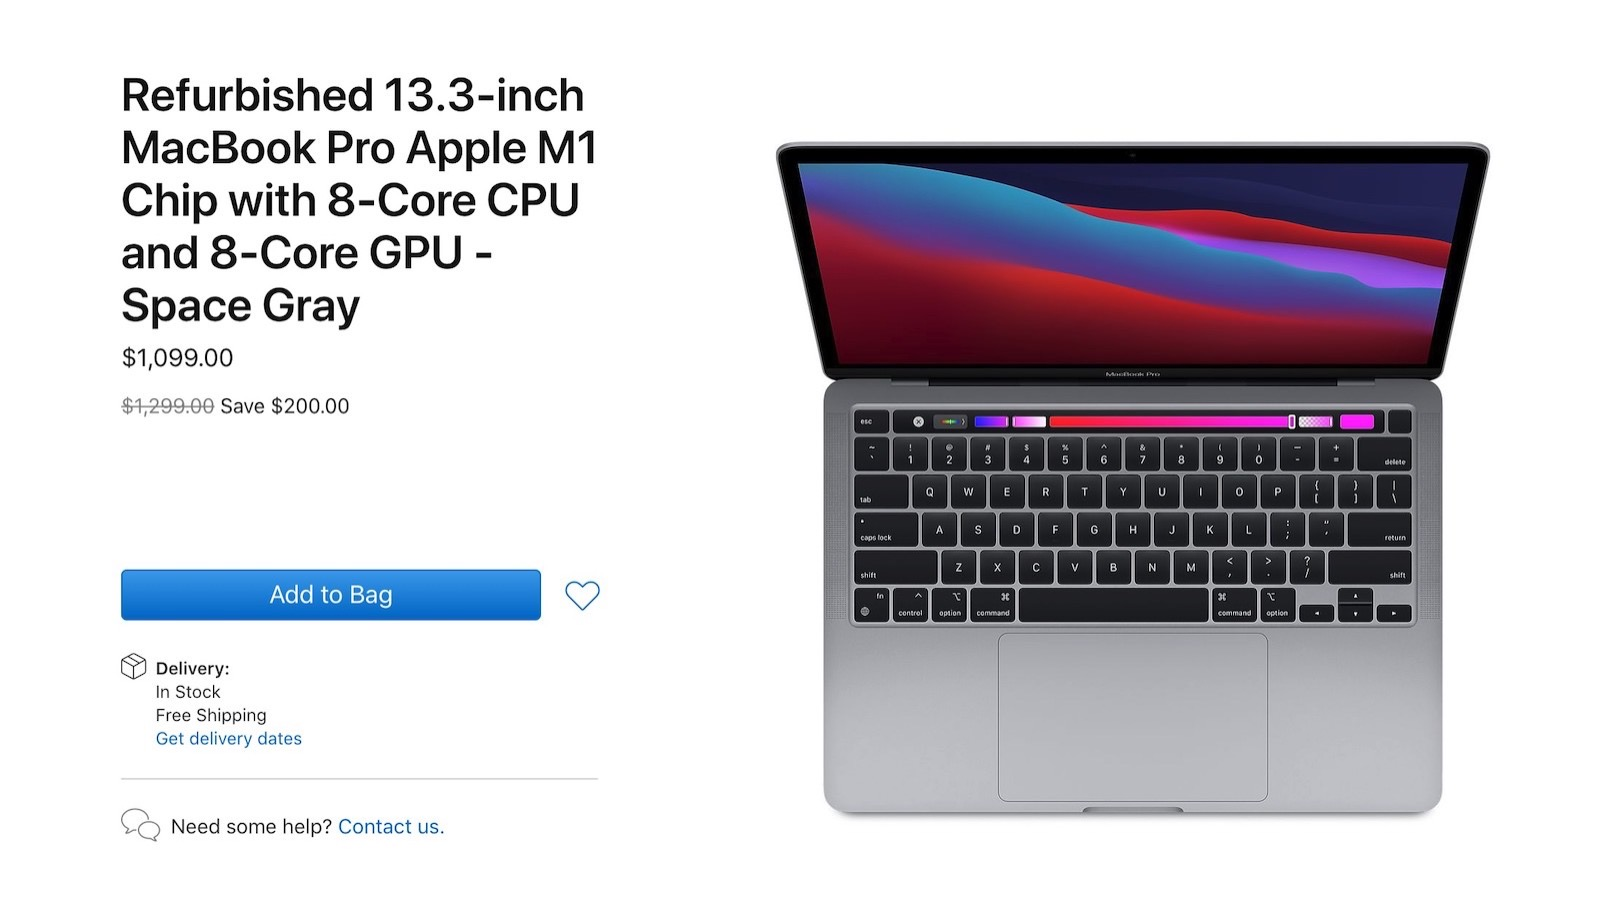 M1 macbook pro refurbished models